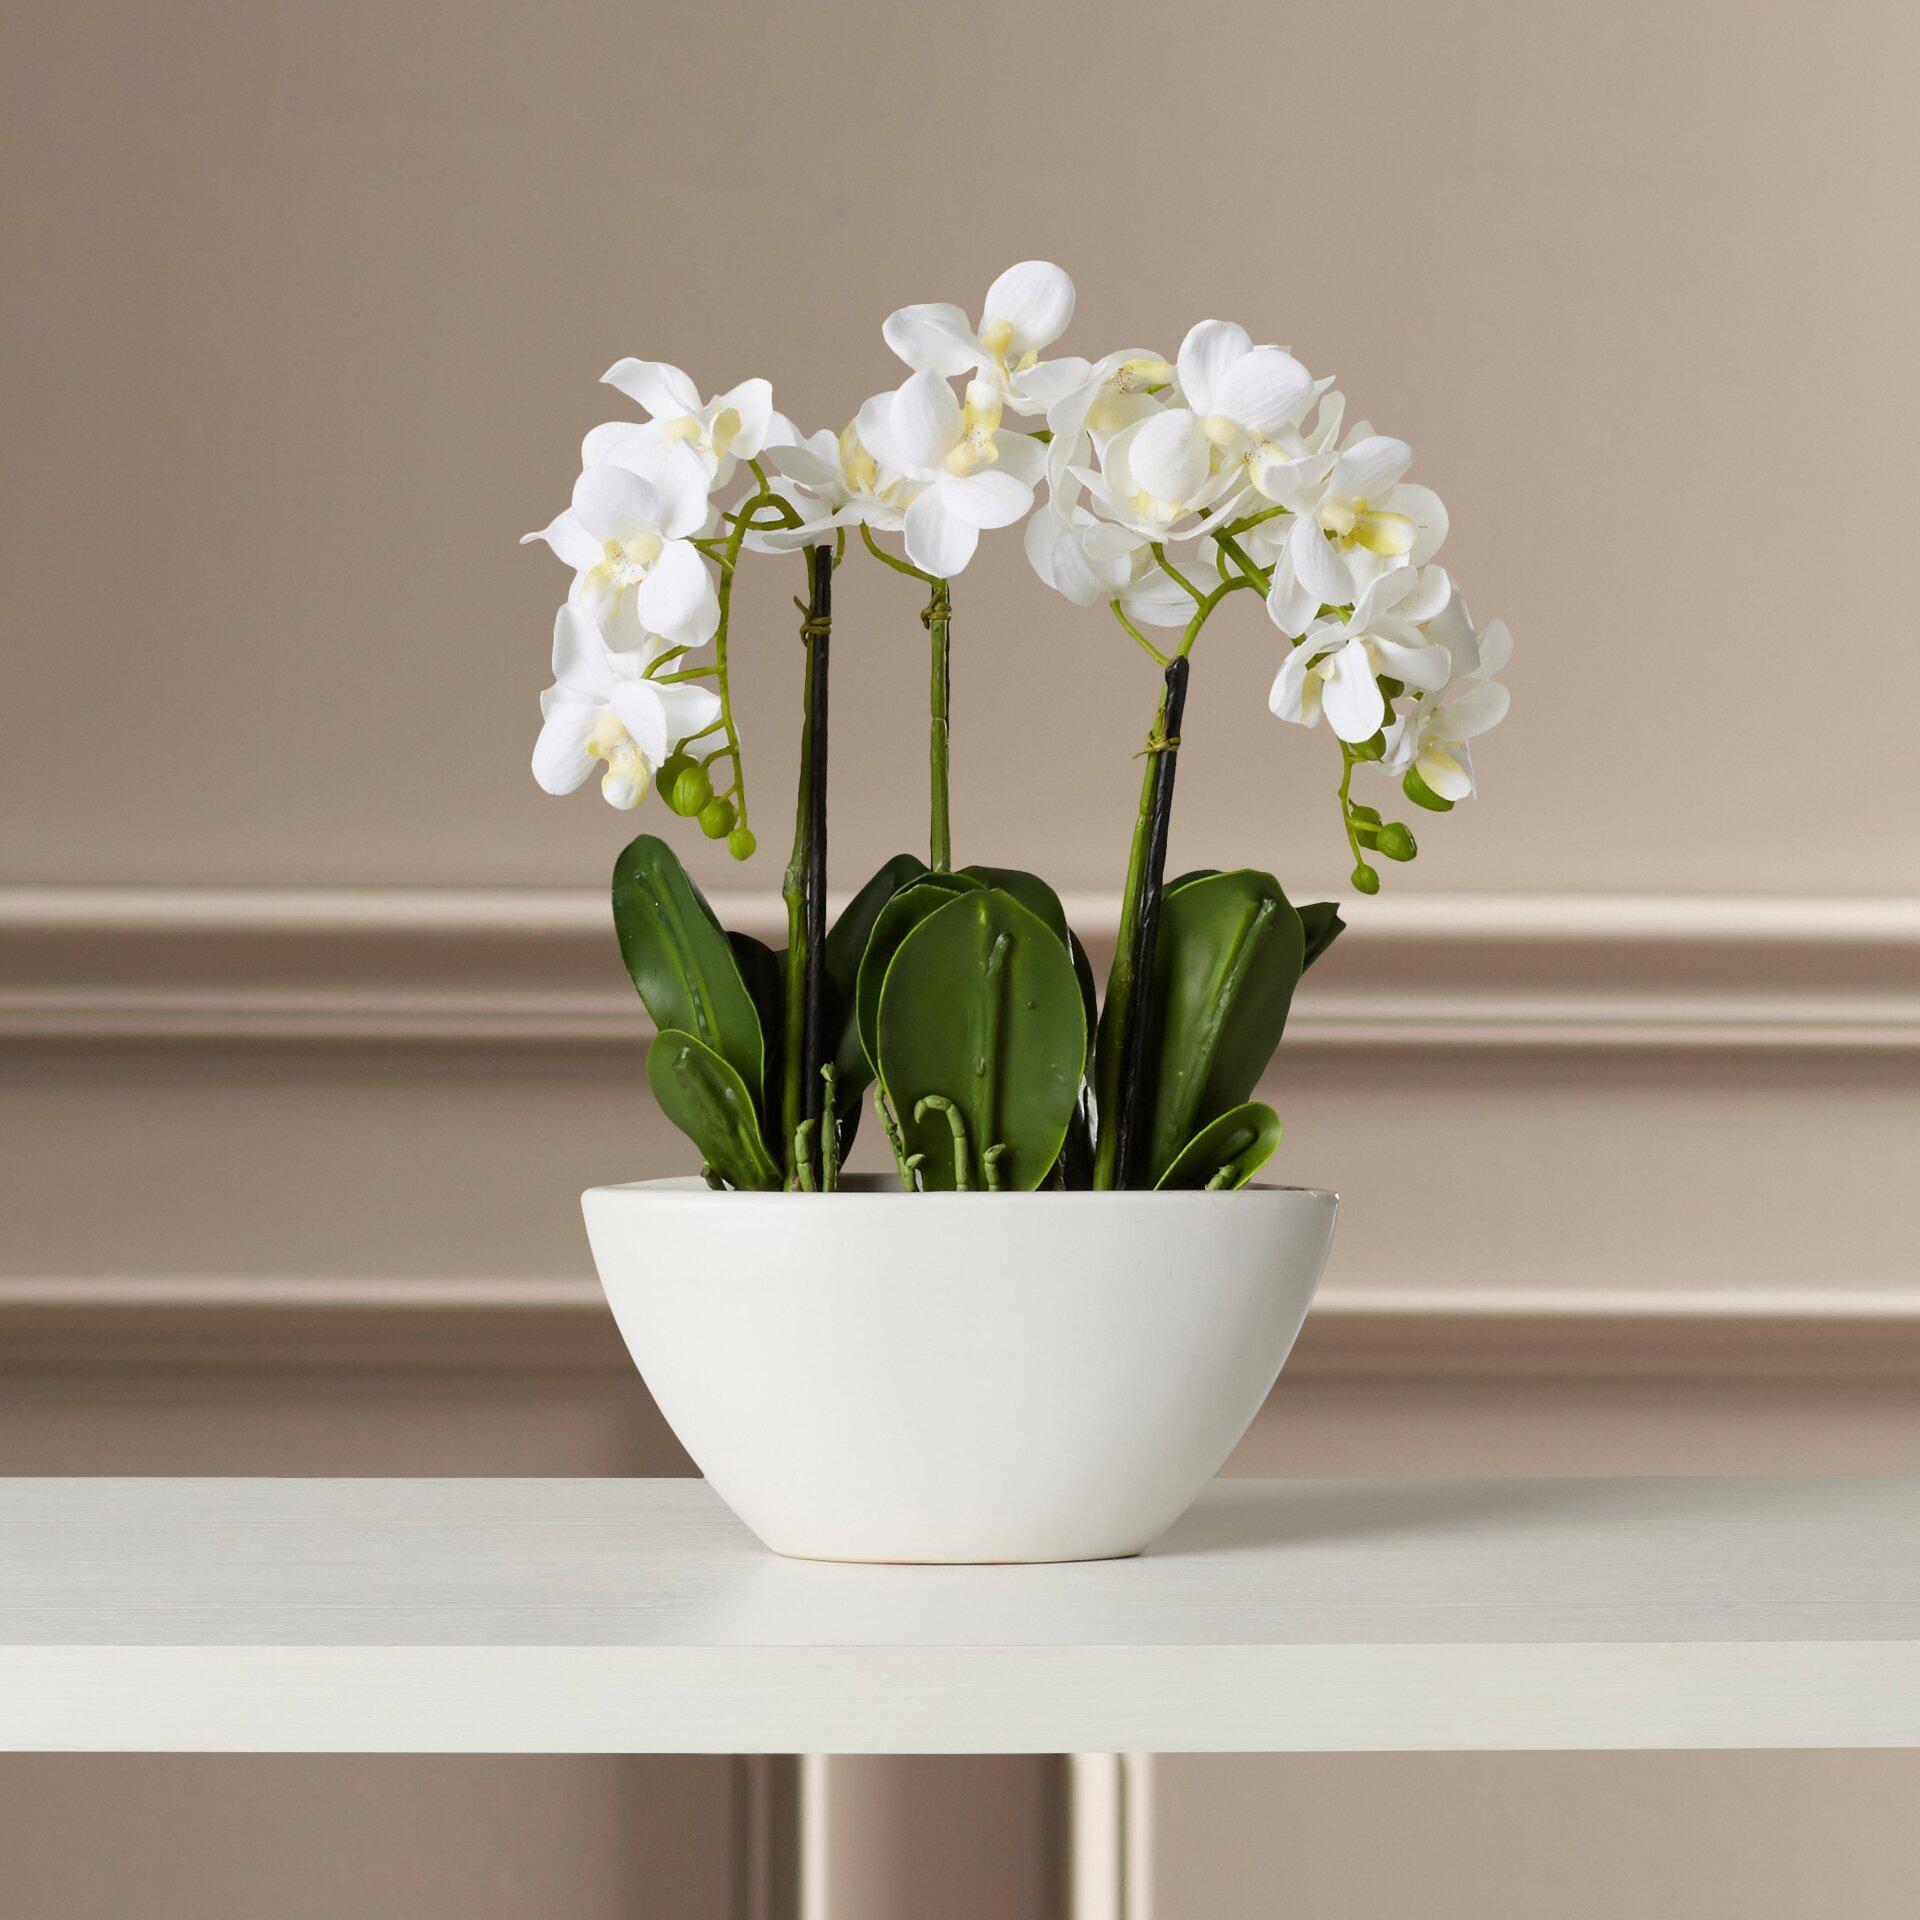 Flowers in vase next day delivery - Diy Globe Flower Vase